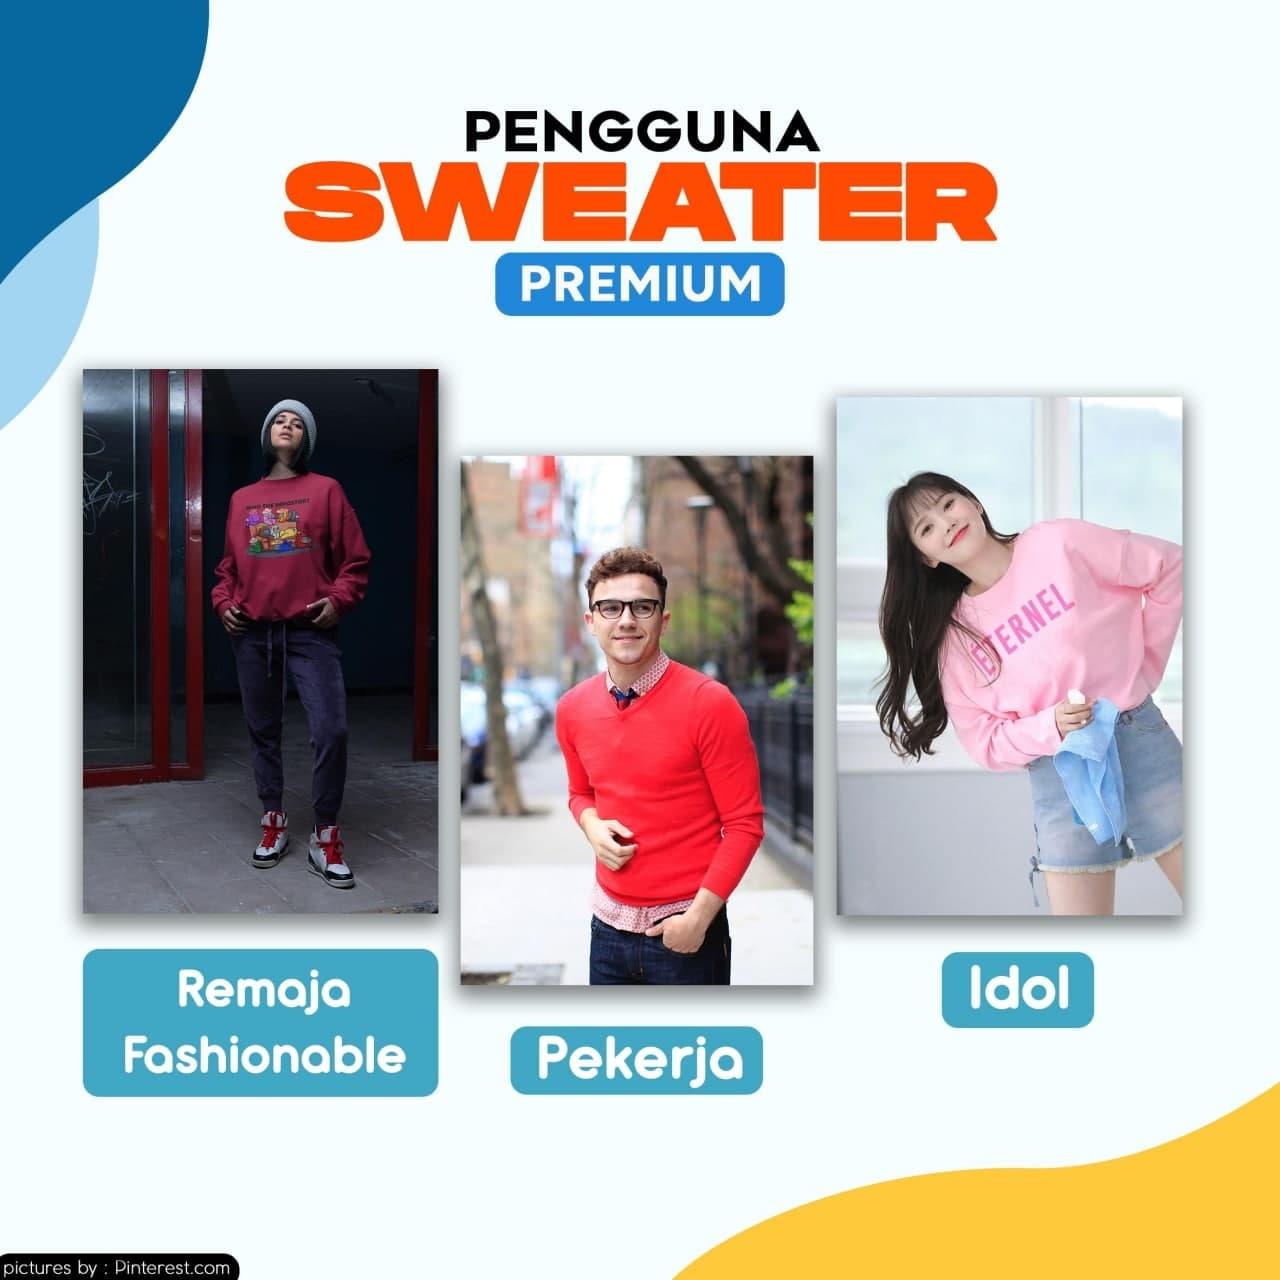 Pengguna Sweater Premium Idol